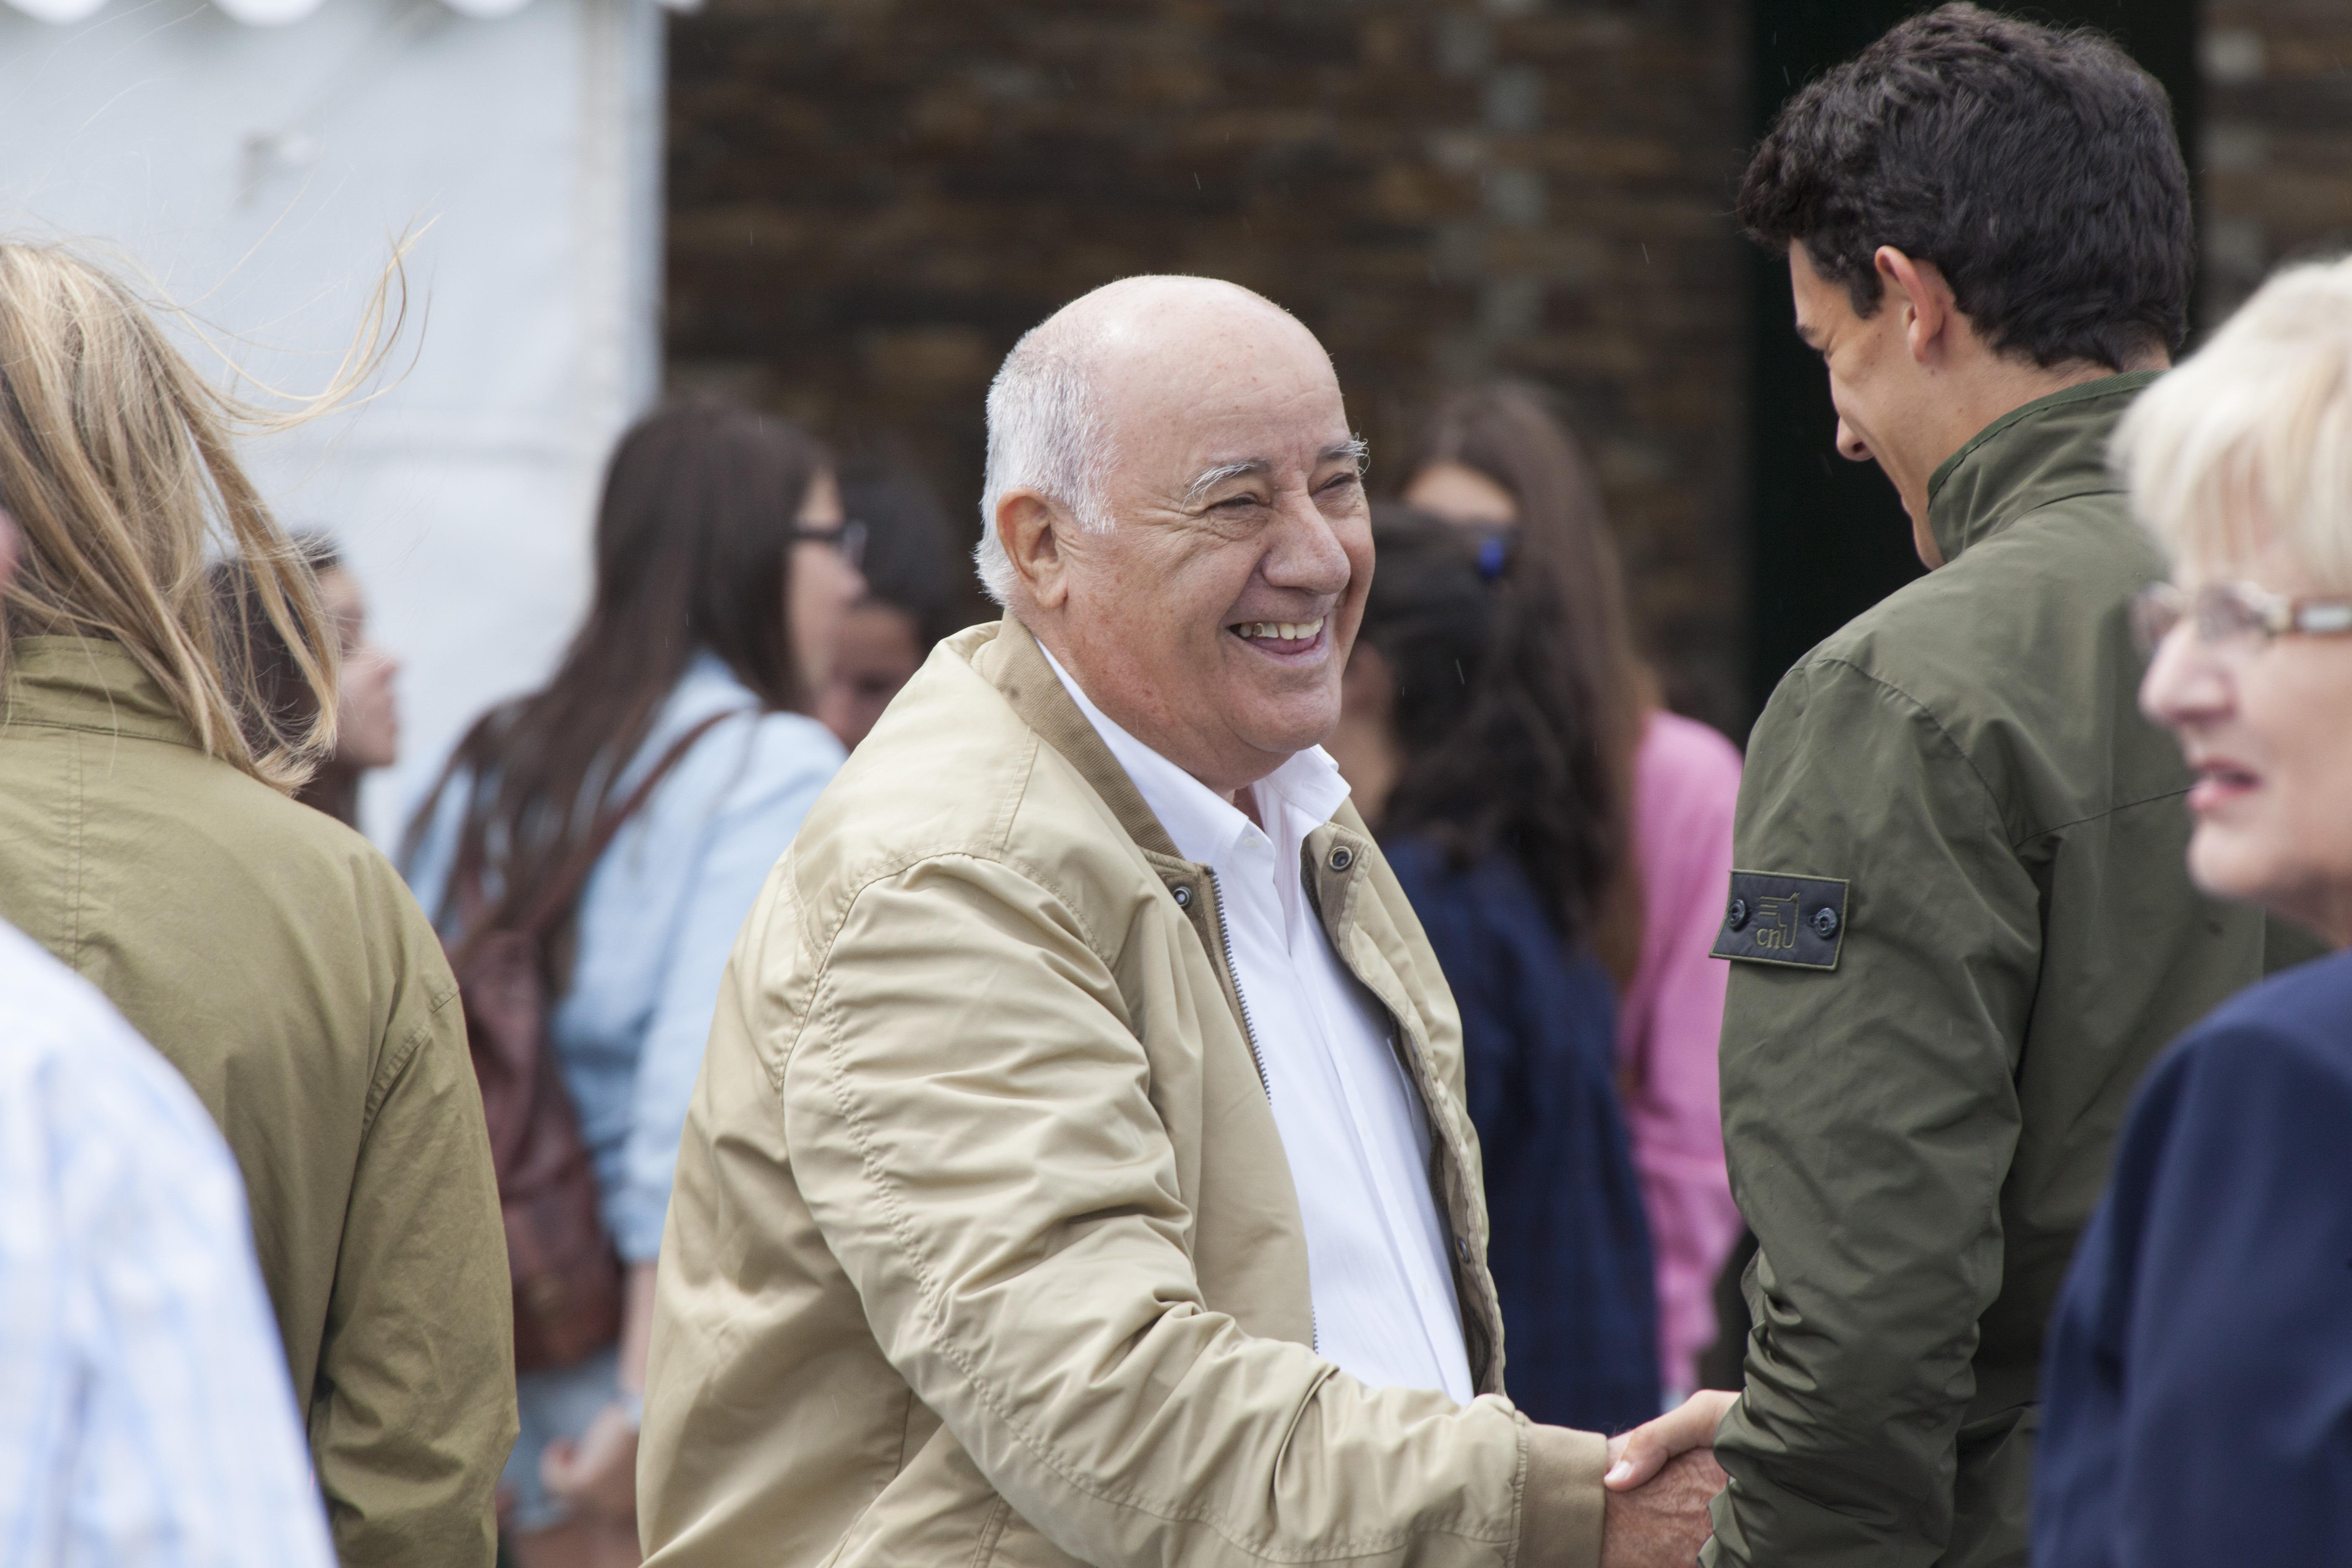 Amancio Ortega, owner of Zara empire, meets some friends at CSI Casas Novas Horse Jumping Competition 2013 near Arteixo on July 27, 2013 in A Coruna, Spain.